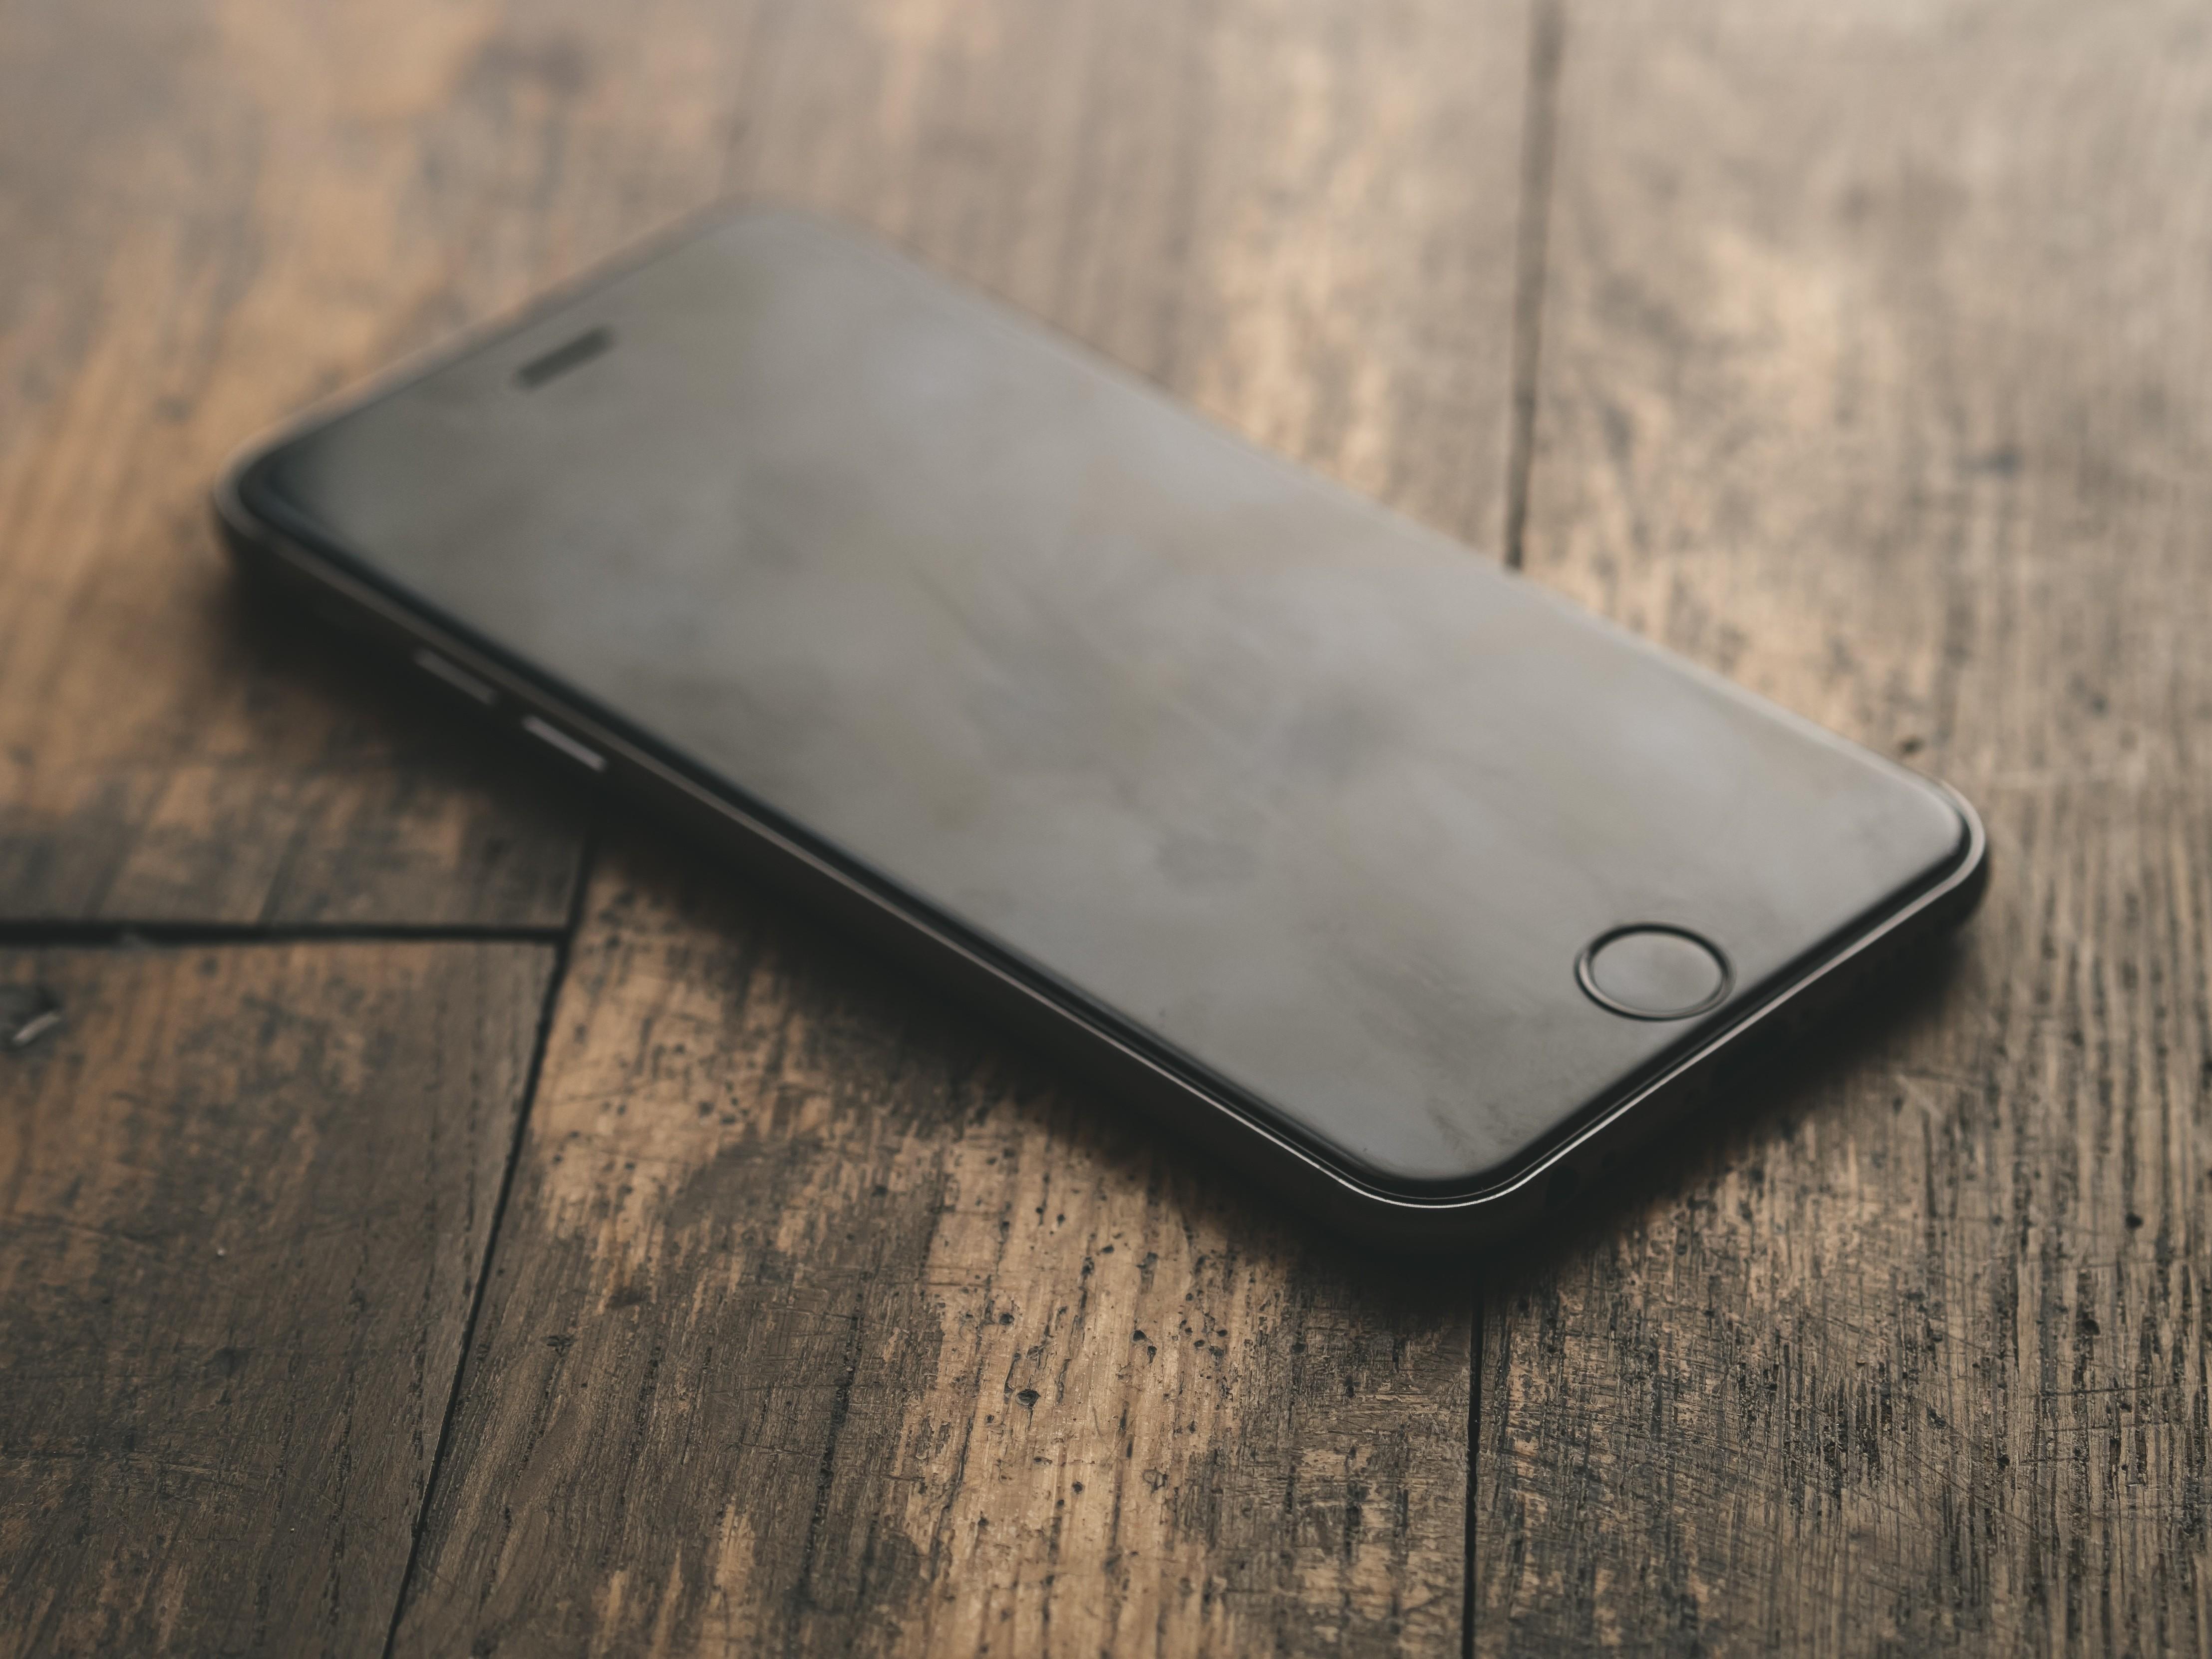 General 4431x3323 iPhone wood smartphone